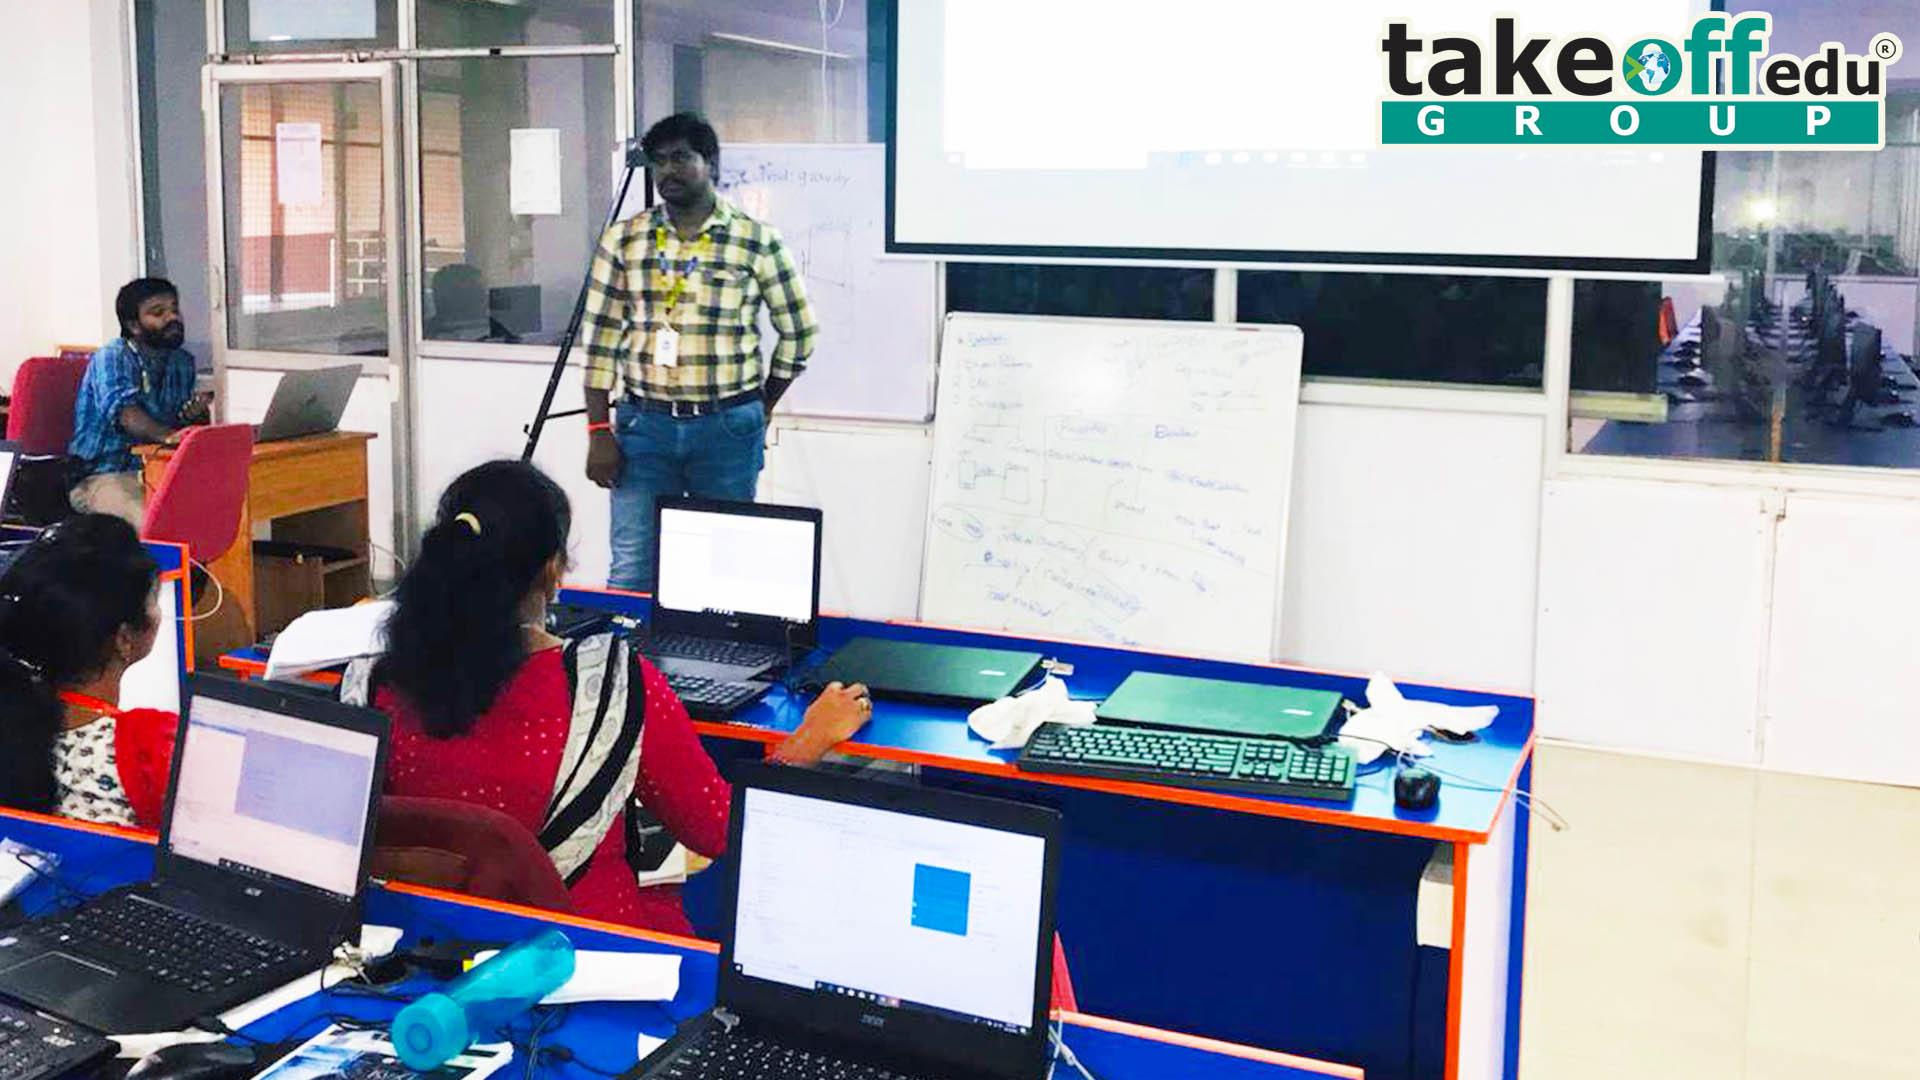 Chadalawada Ramanamma Engineering College, Tirupati , Android Applications